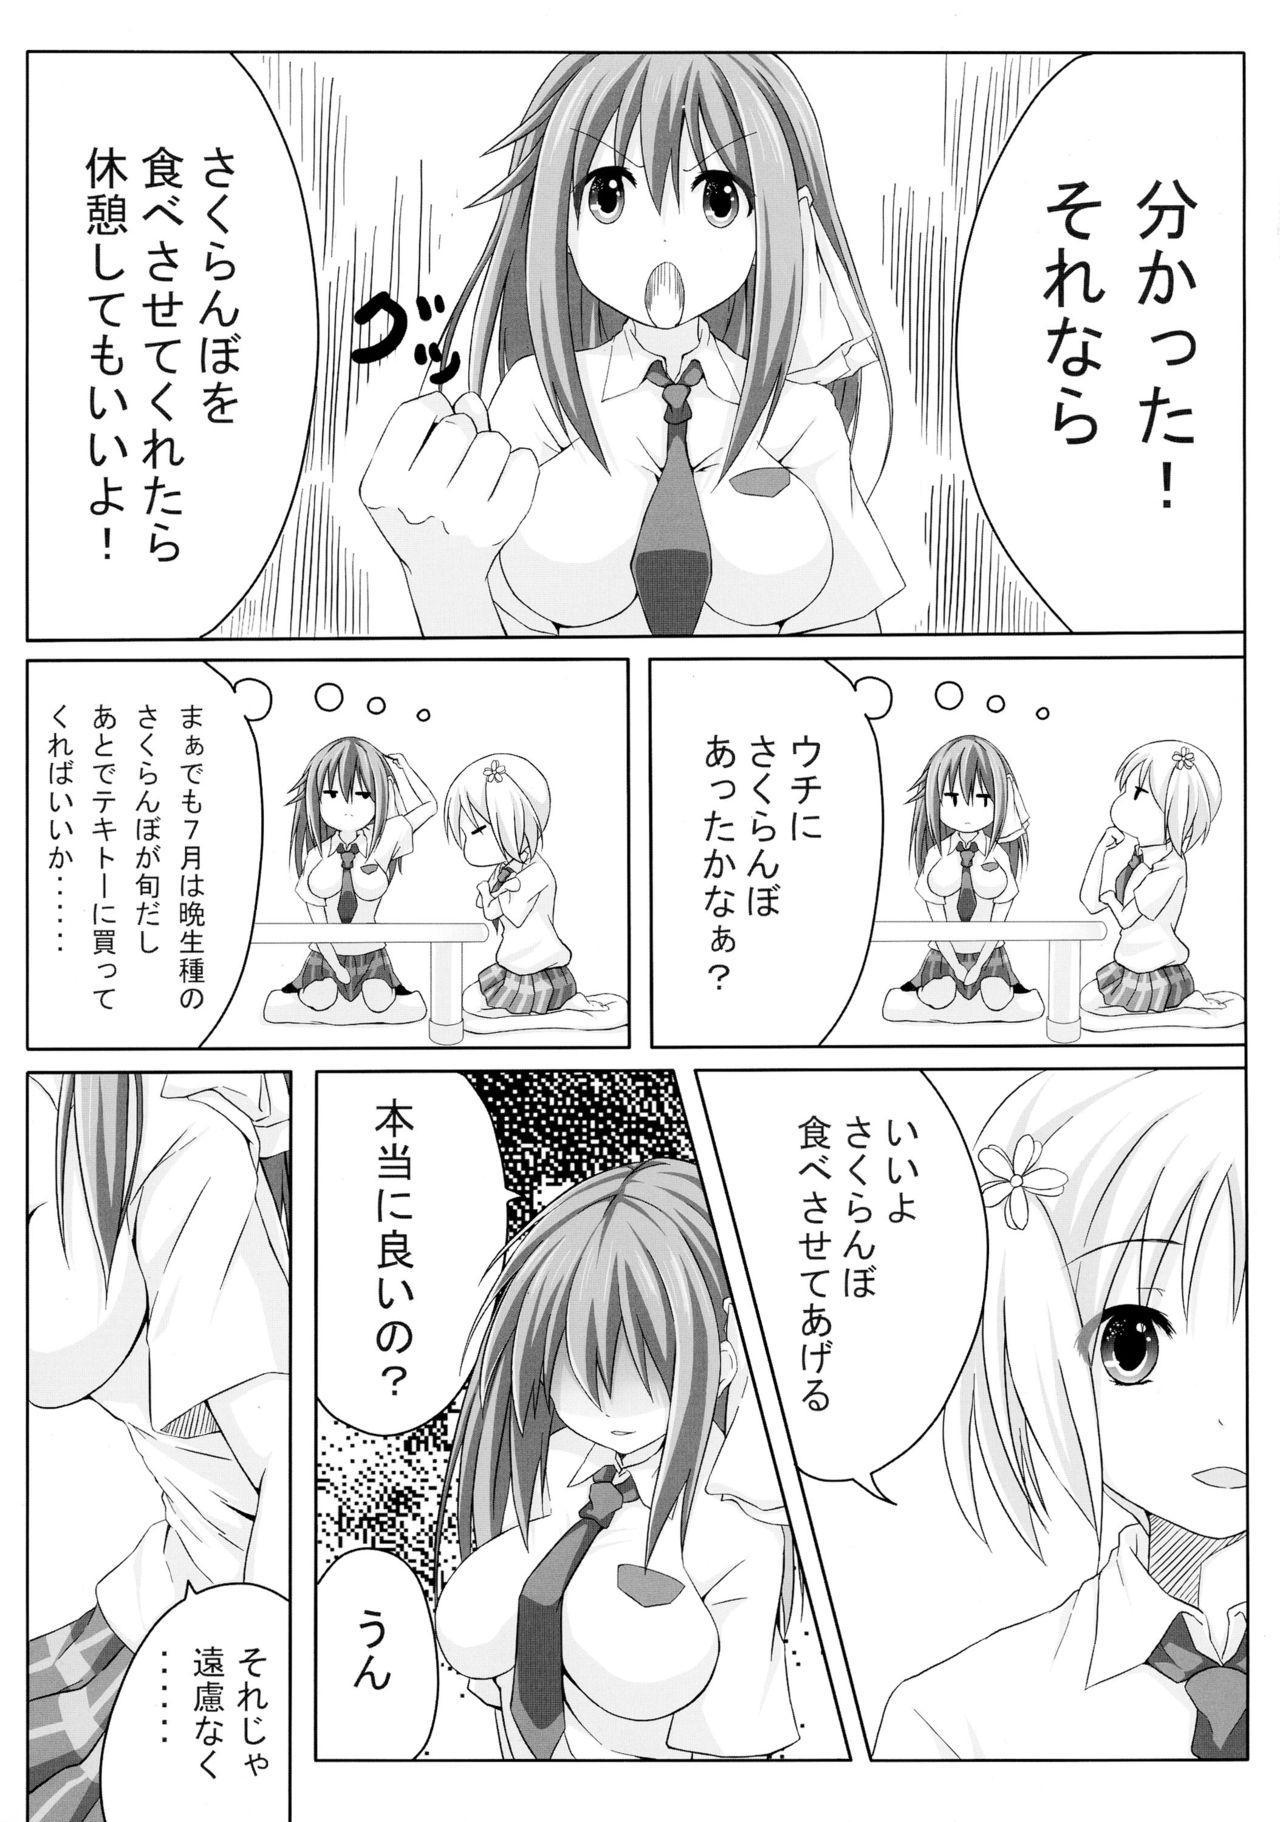 Sakura Strip 4